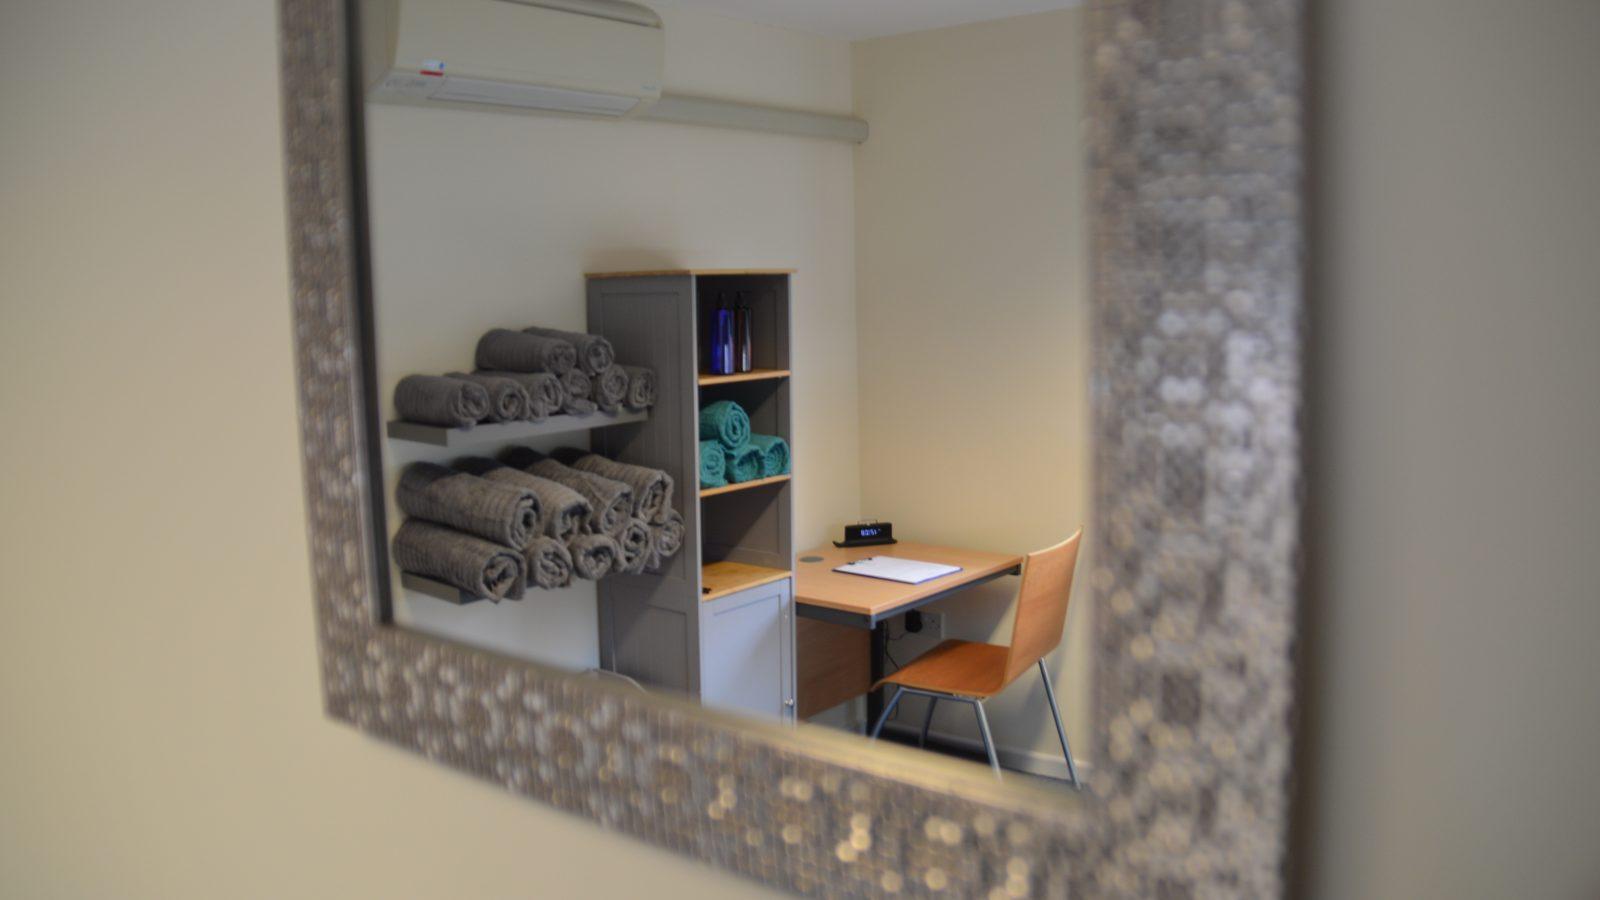 Sports massage treatment room image